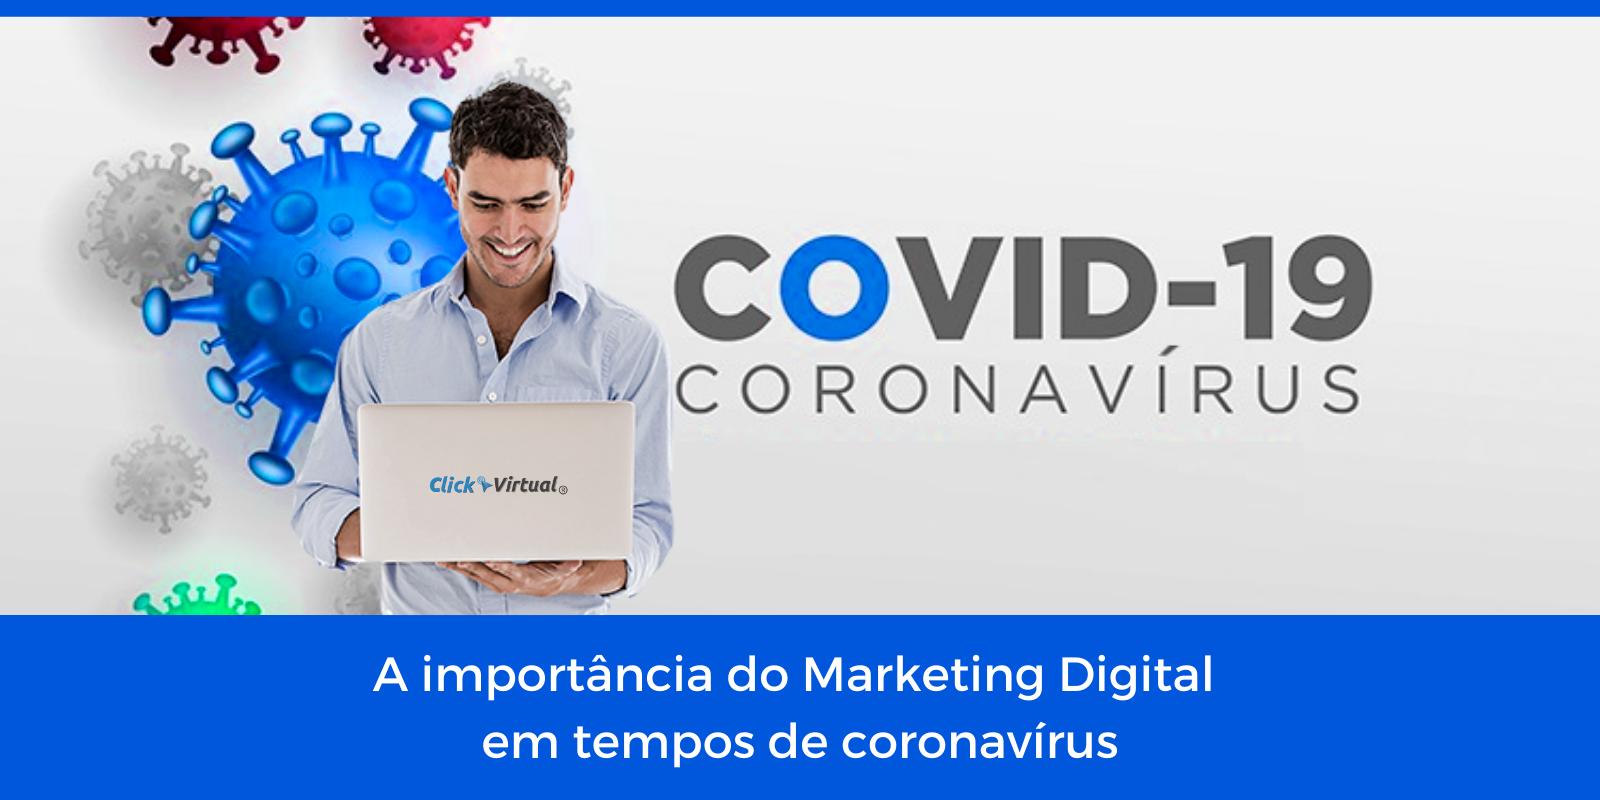 Marketing digital na crise do COVID-19